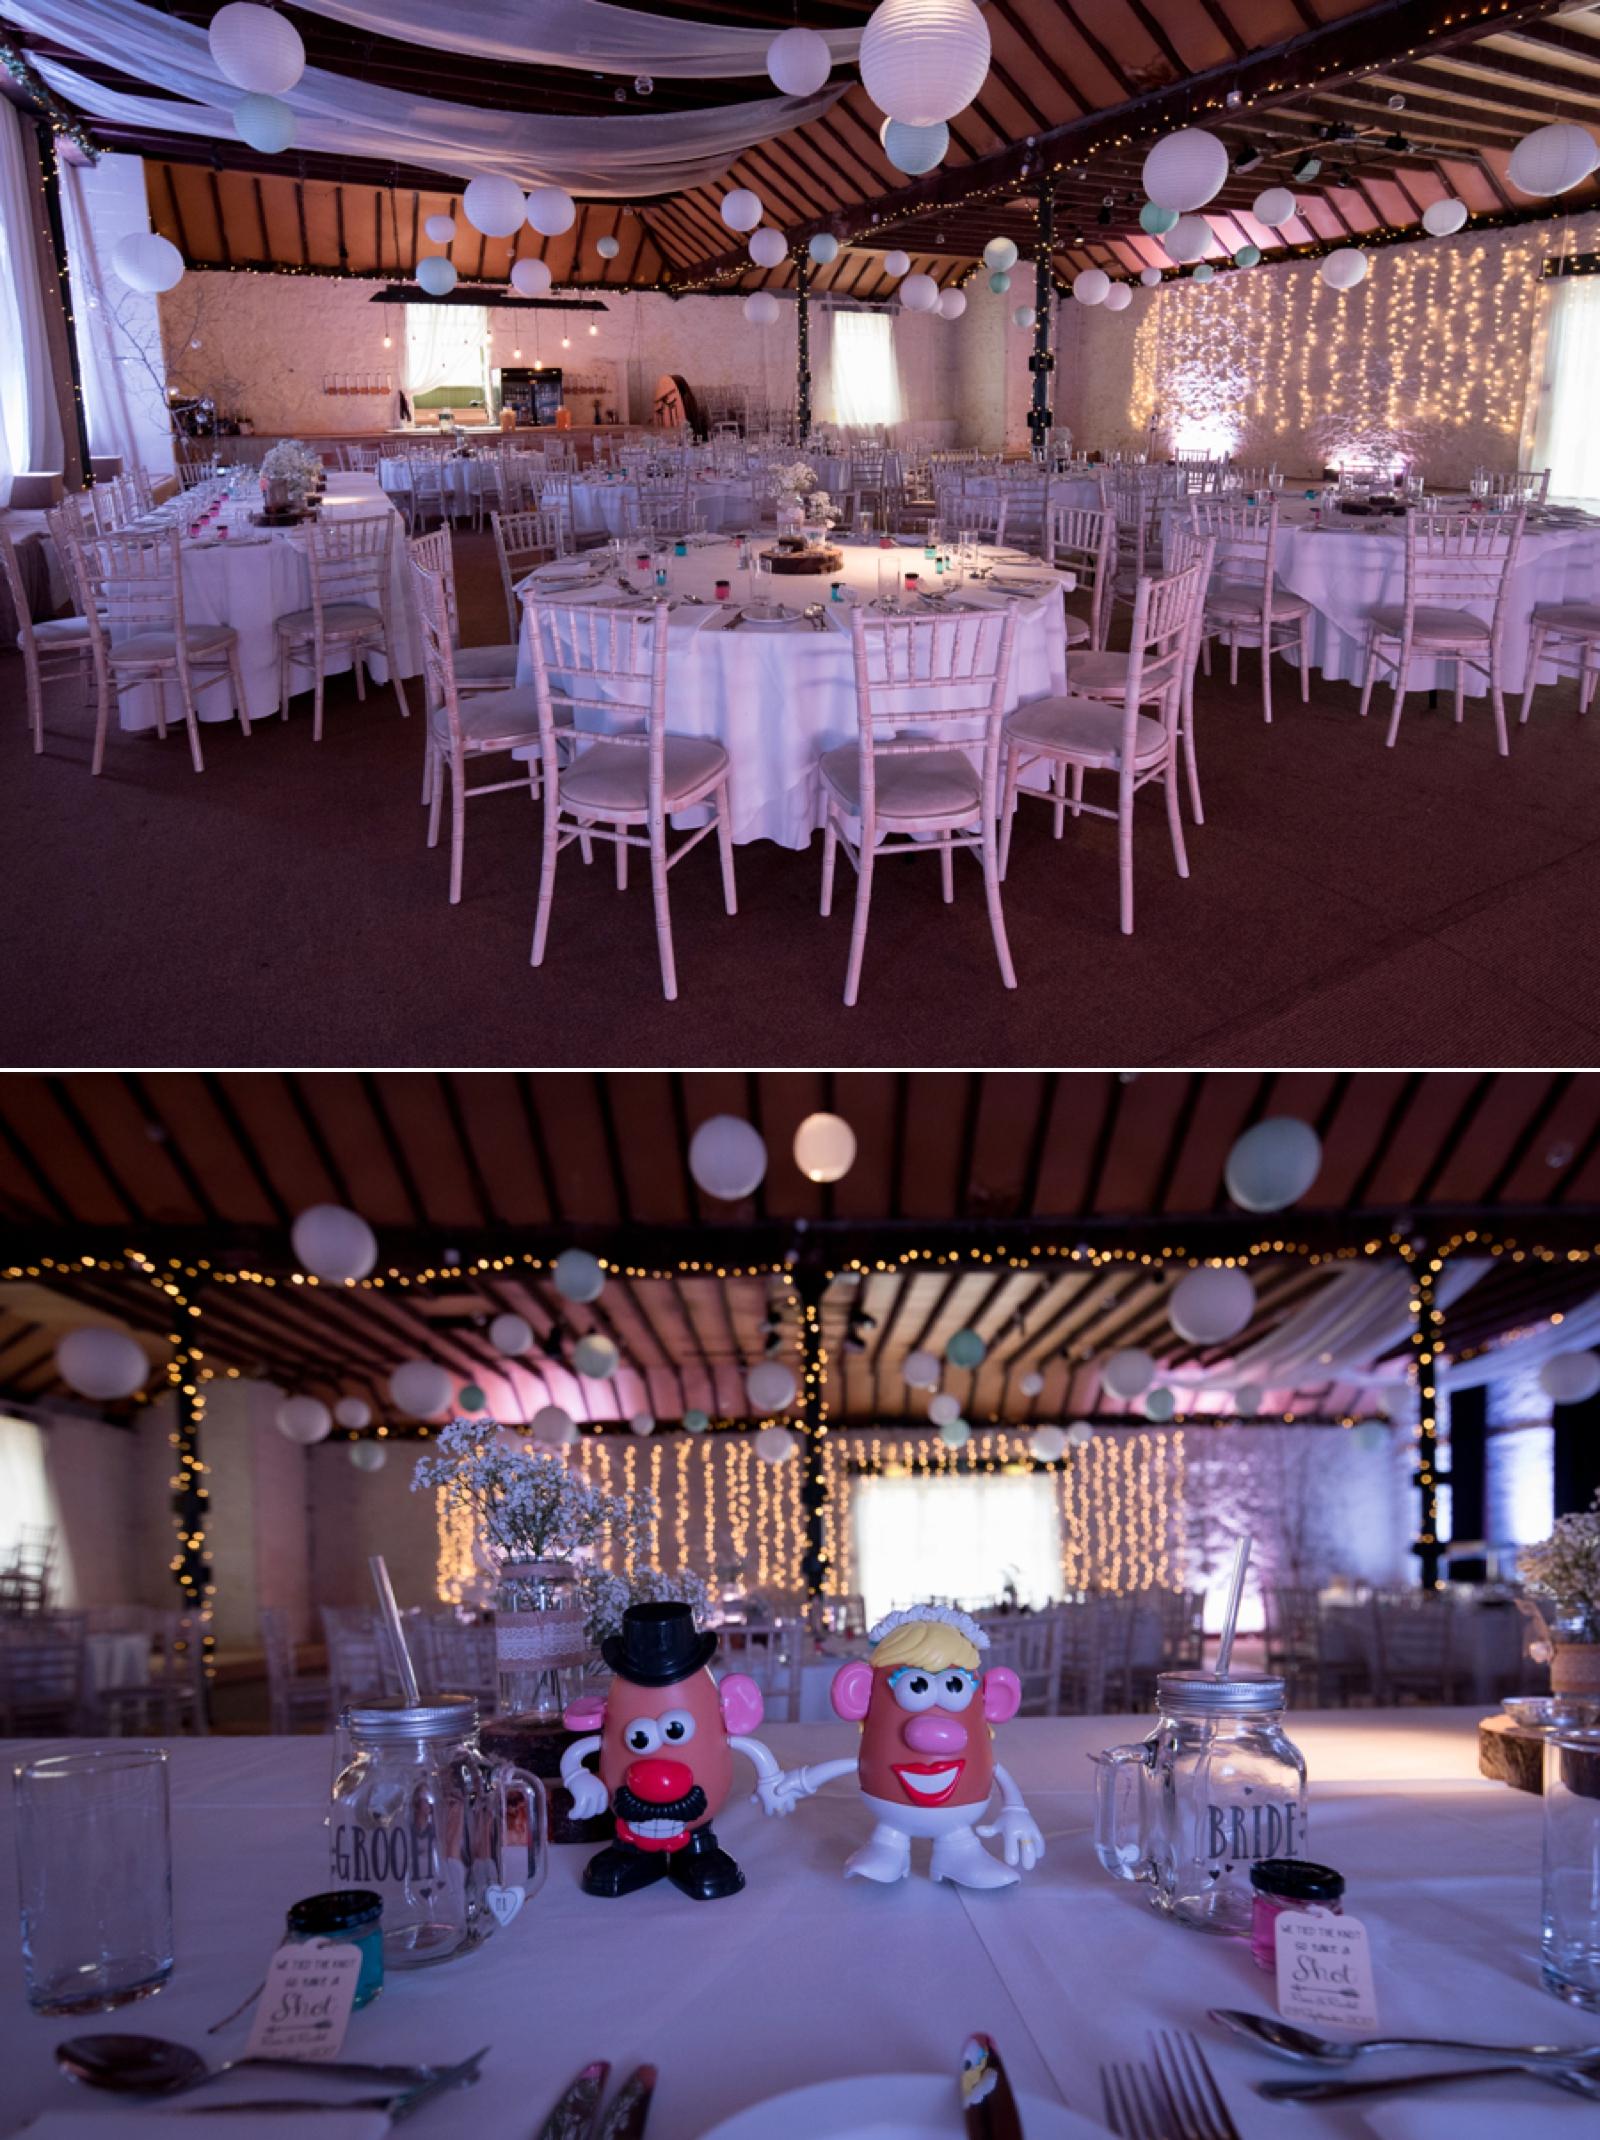 2017-09-23 (Mearns) Pratis Farm Wedding Photography144010.jpg